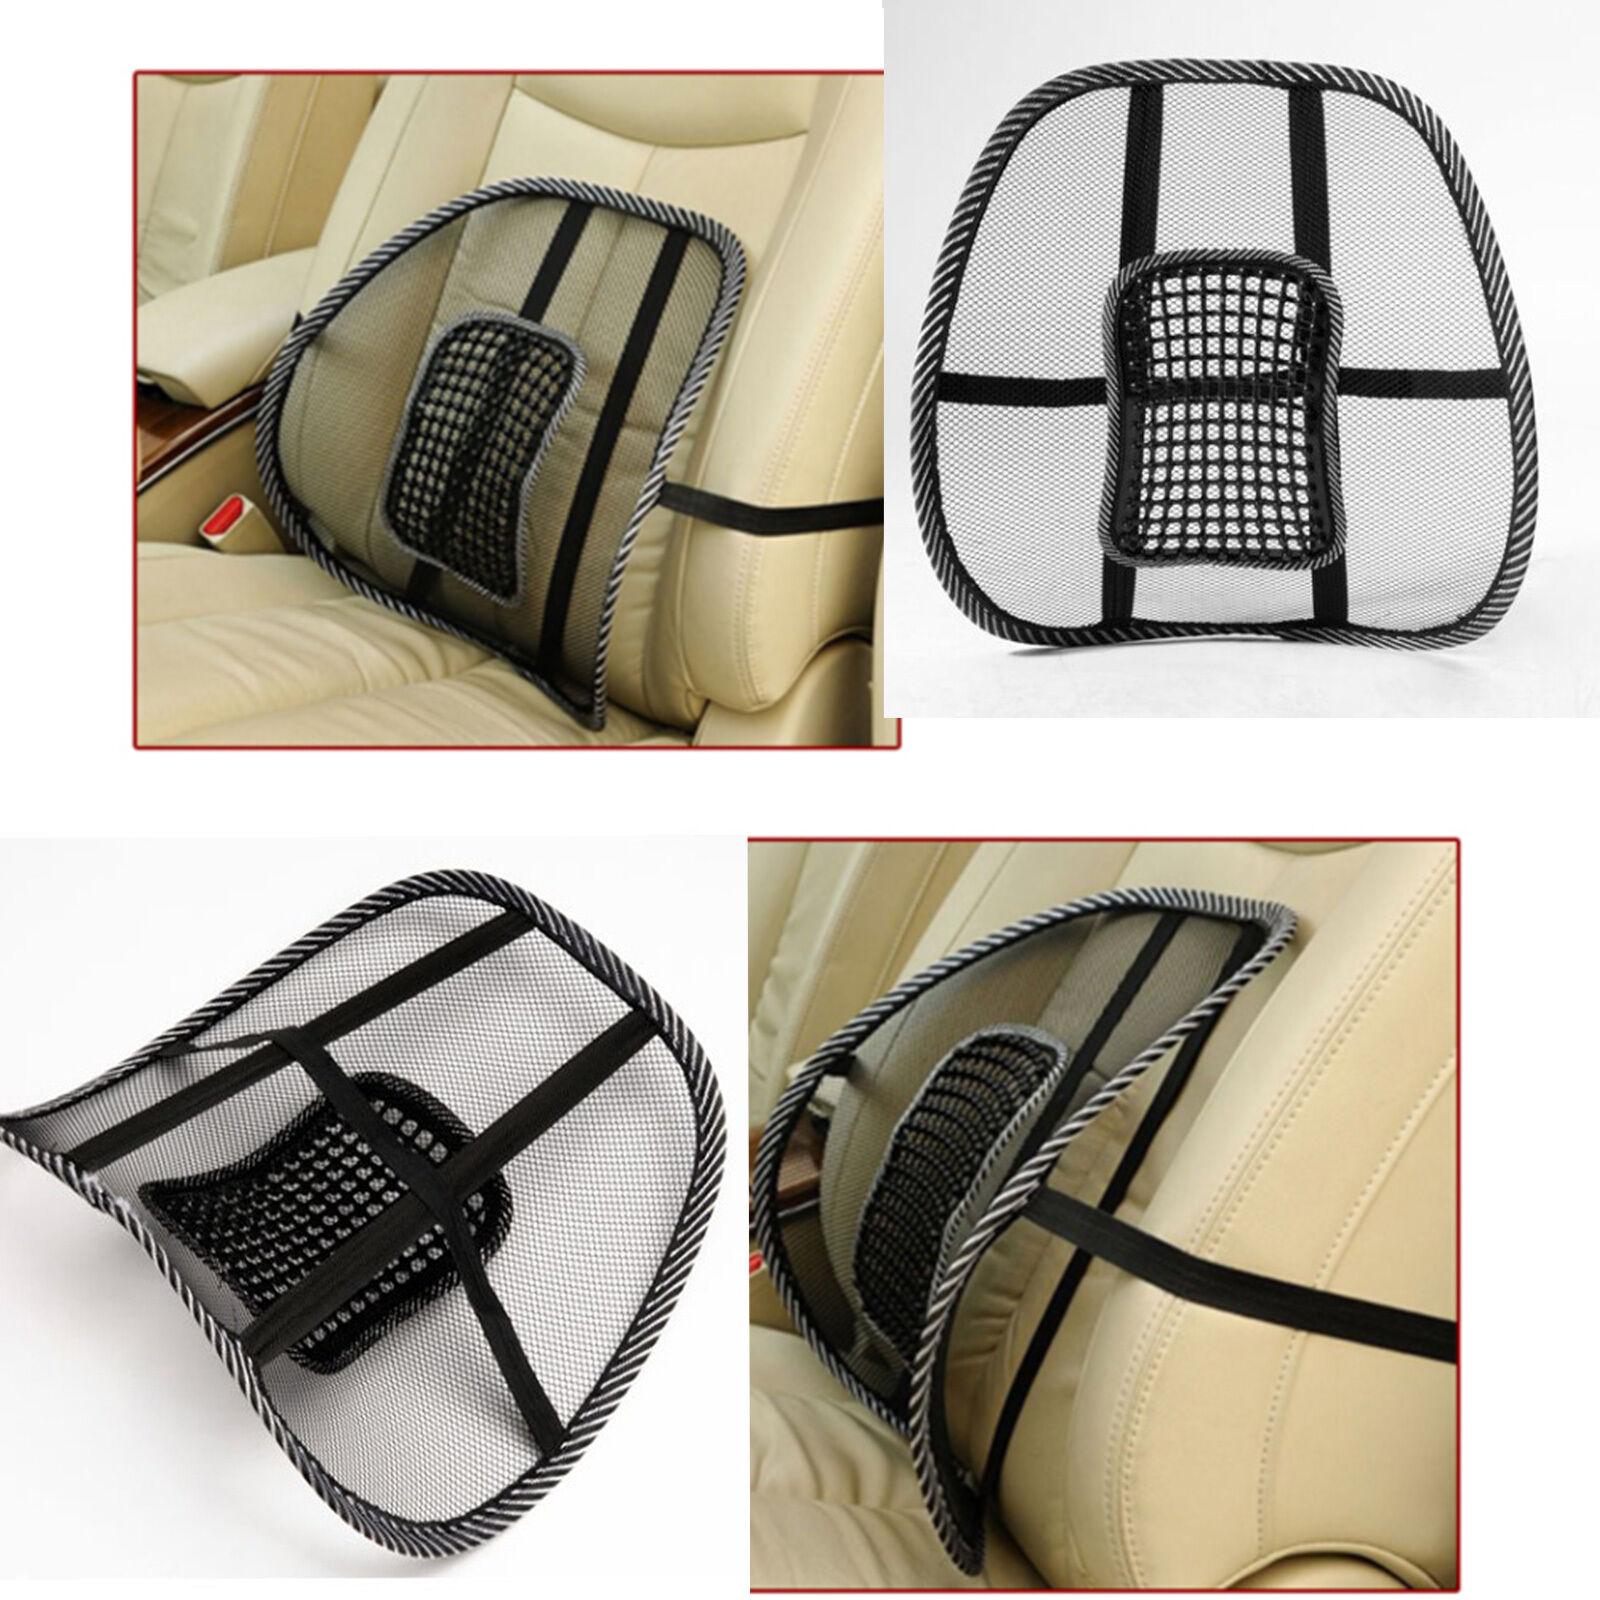 Mesh Lumbar Lower Back Support Cushion Seat Posture Corrector Car